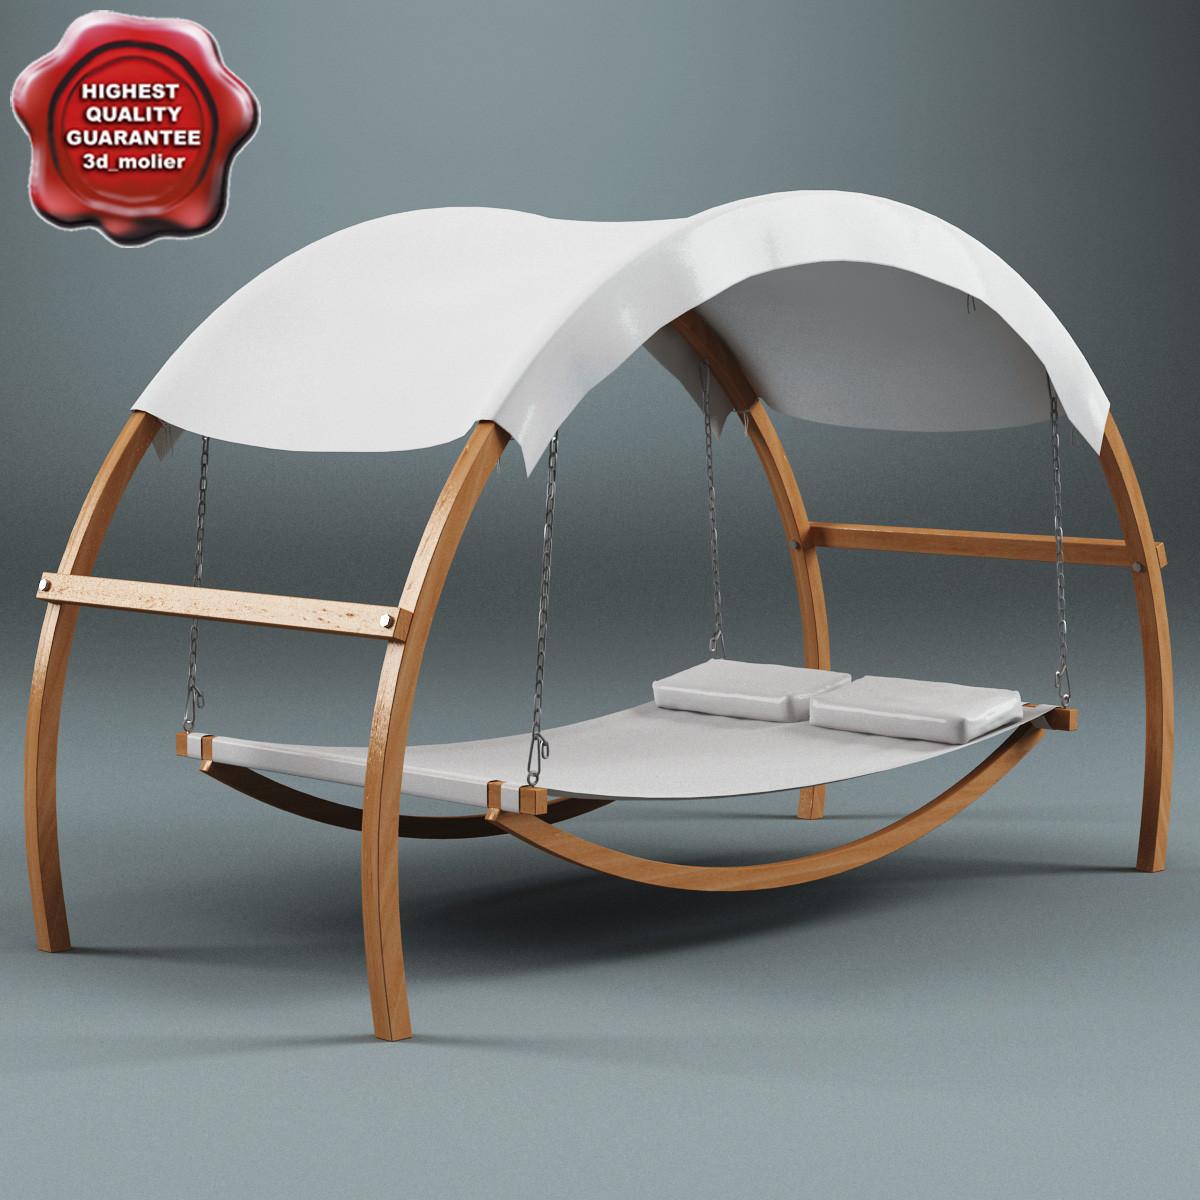 3ds max garden swing gazebo bed